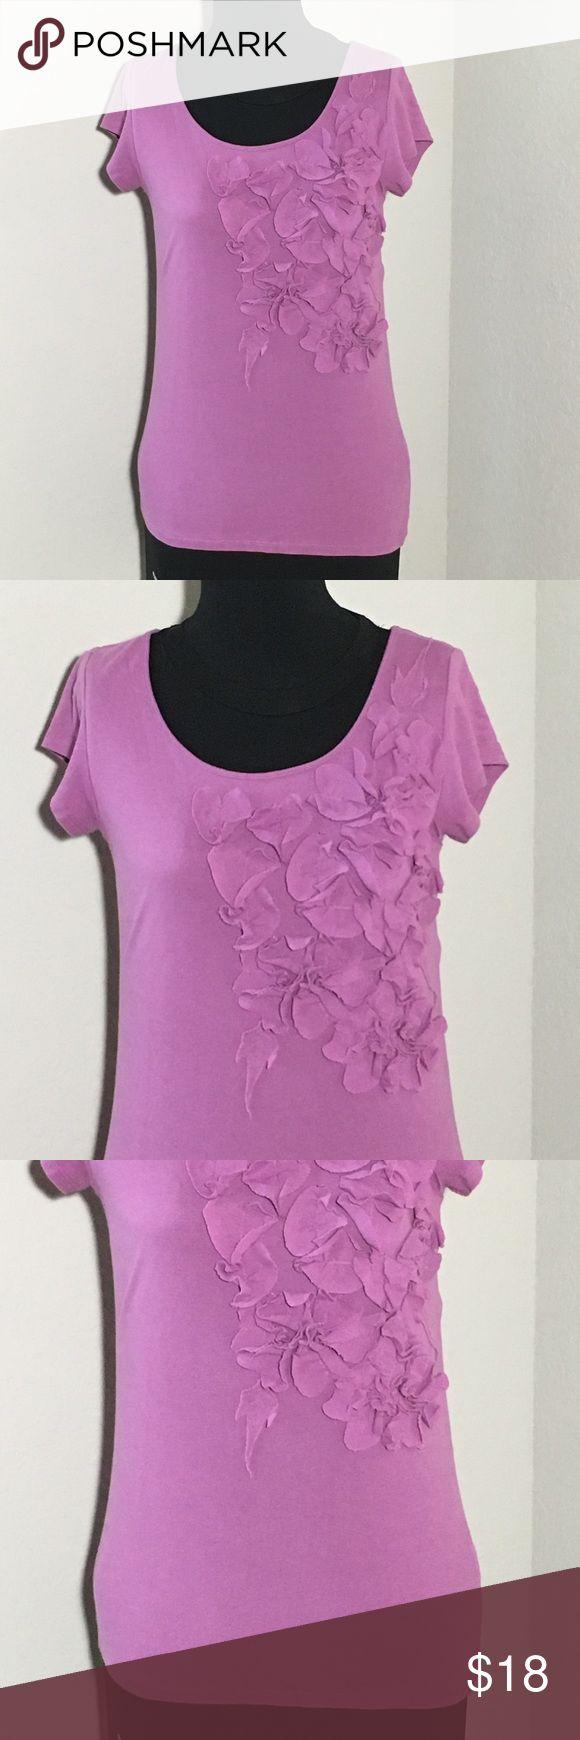 "Garnet Hill Purple Fitted T Shirt 3D Flowers XS Women's Garnet Hill purple short sleeve fitted t shirt with 3D flower details Sz XS measurements 16"" armpit to armpit, 25"" shoulder to hem. Excellent condition no flaws Garnet Hill Tops Tees - Short Sleeve"